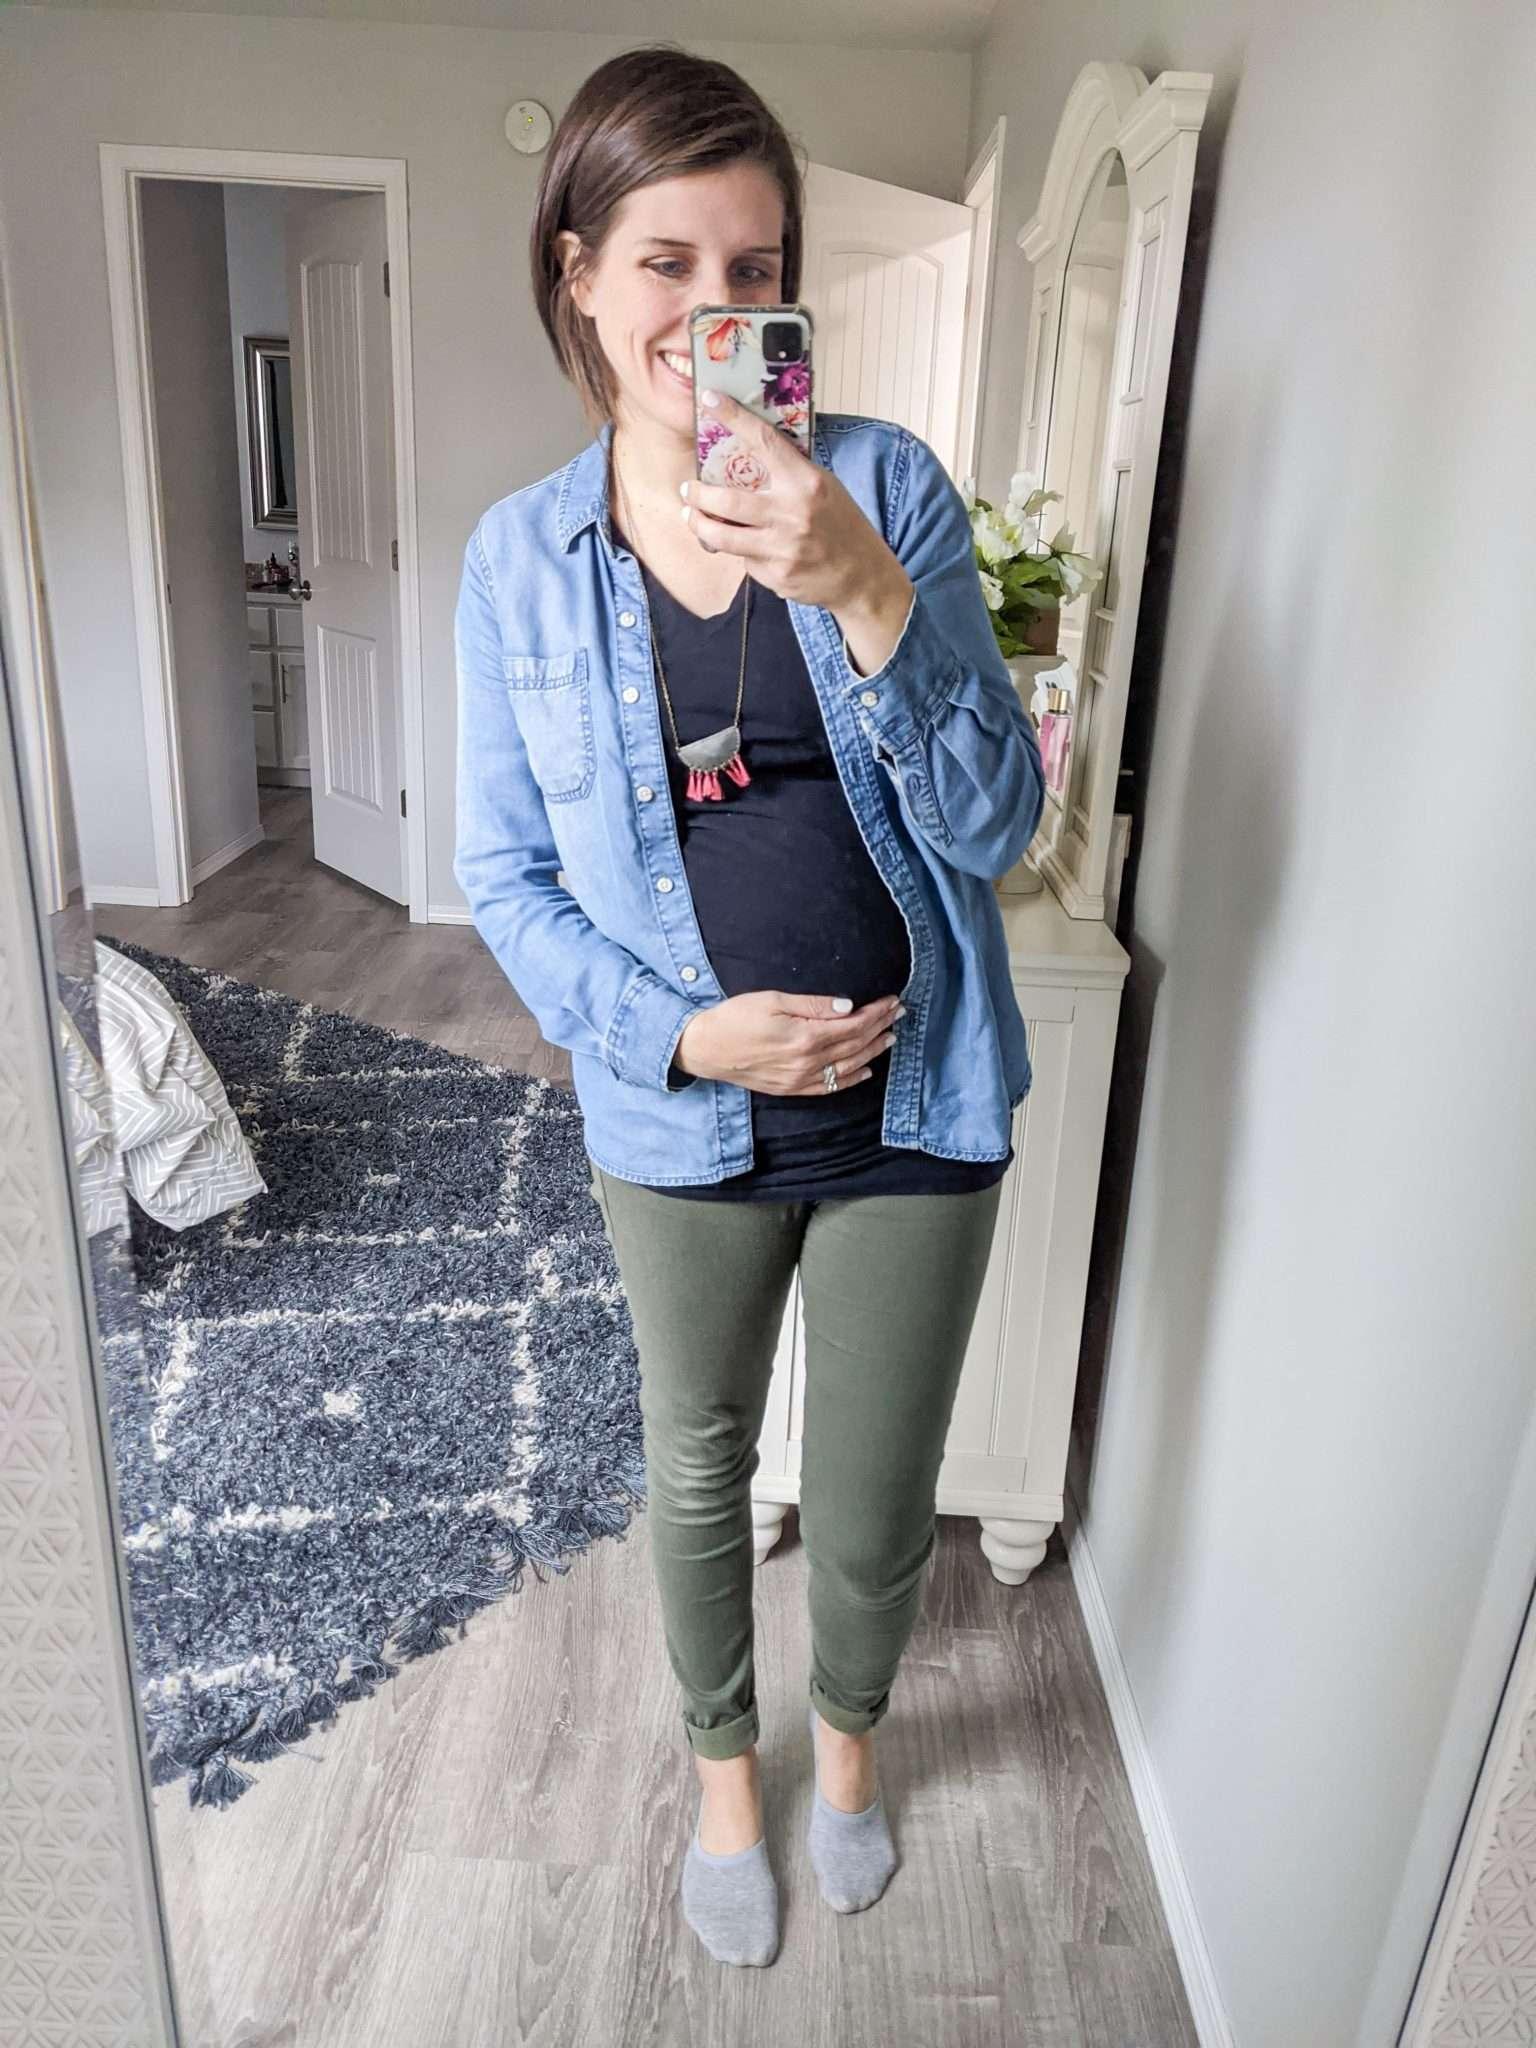 Free Checklist Minimalist Maternity Capsule Wardrobe For A Budget Friendly Pregnancy Easy Fashion For Moms